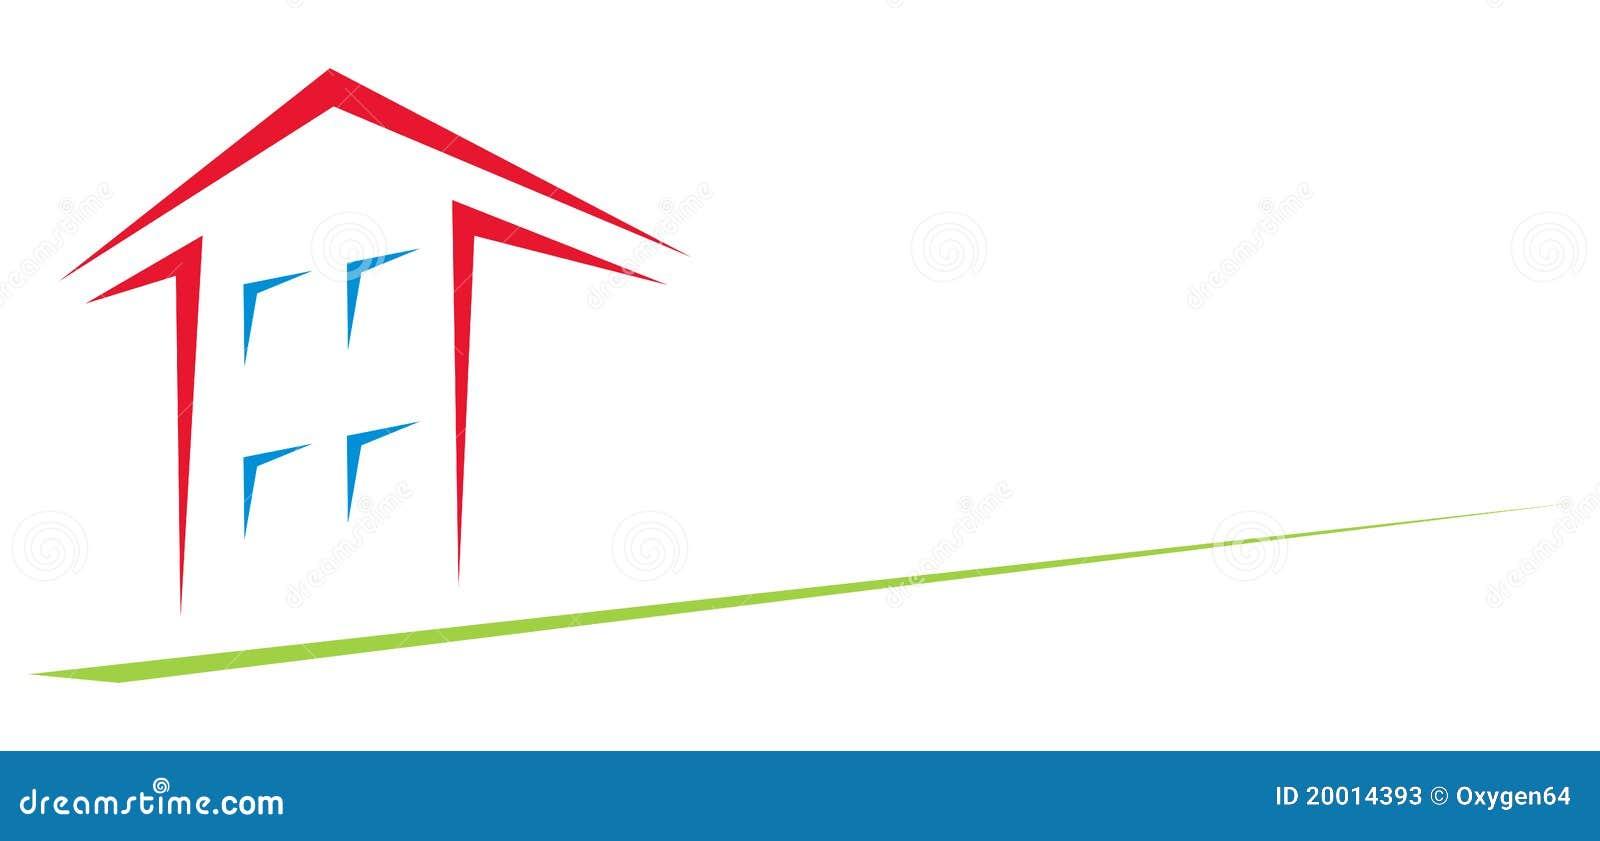 haus am pfeil stockfotos bild 20014393. Black Bedroom Furniture Sets. Home Design Ideas